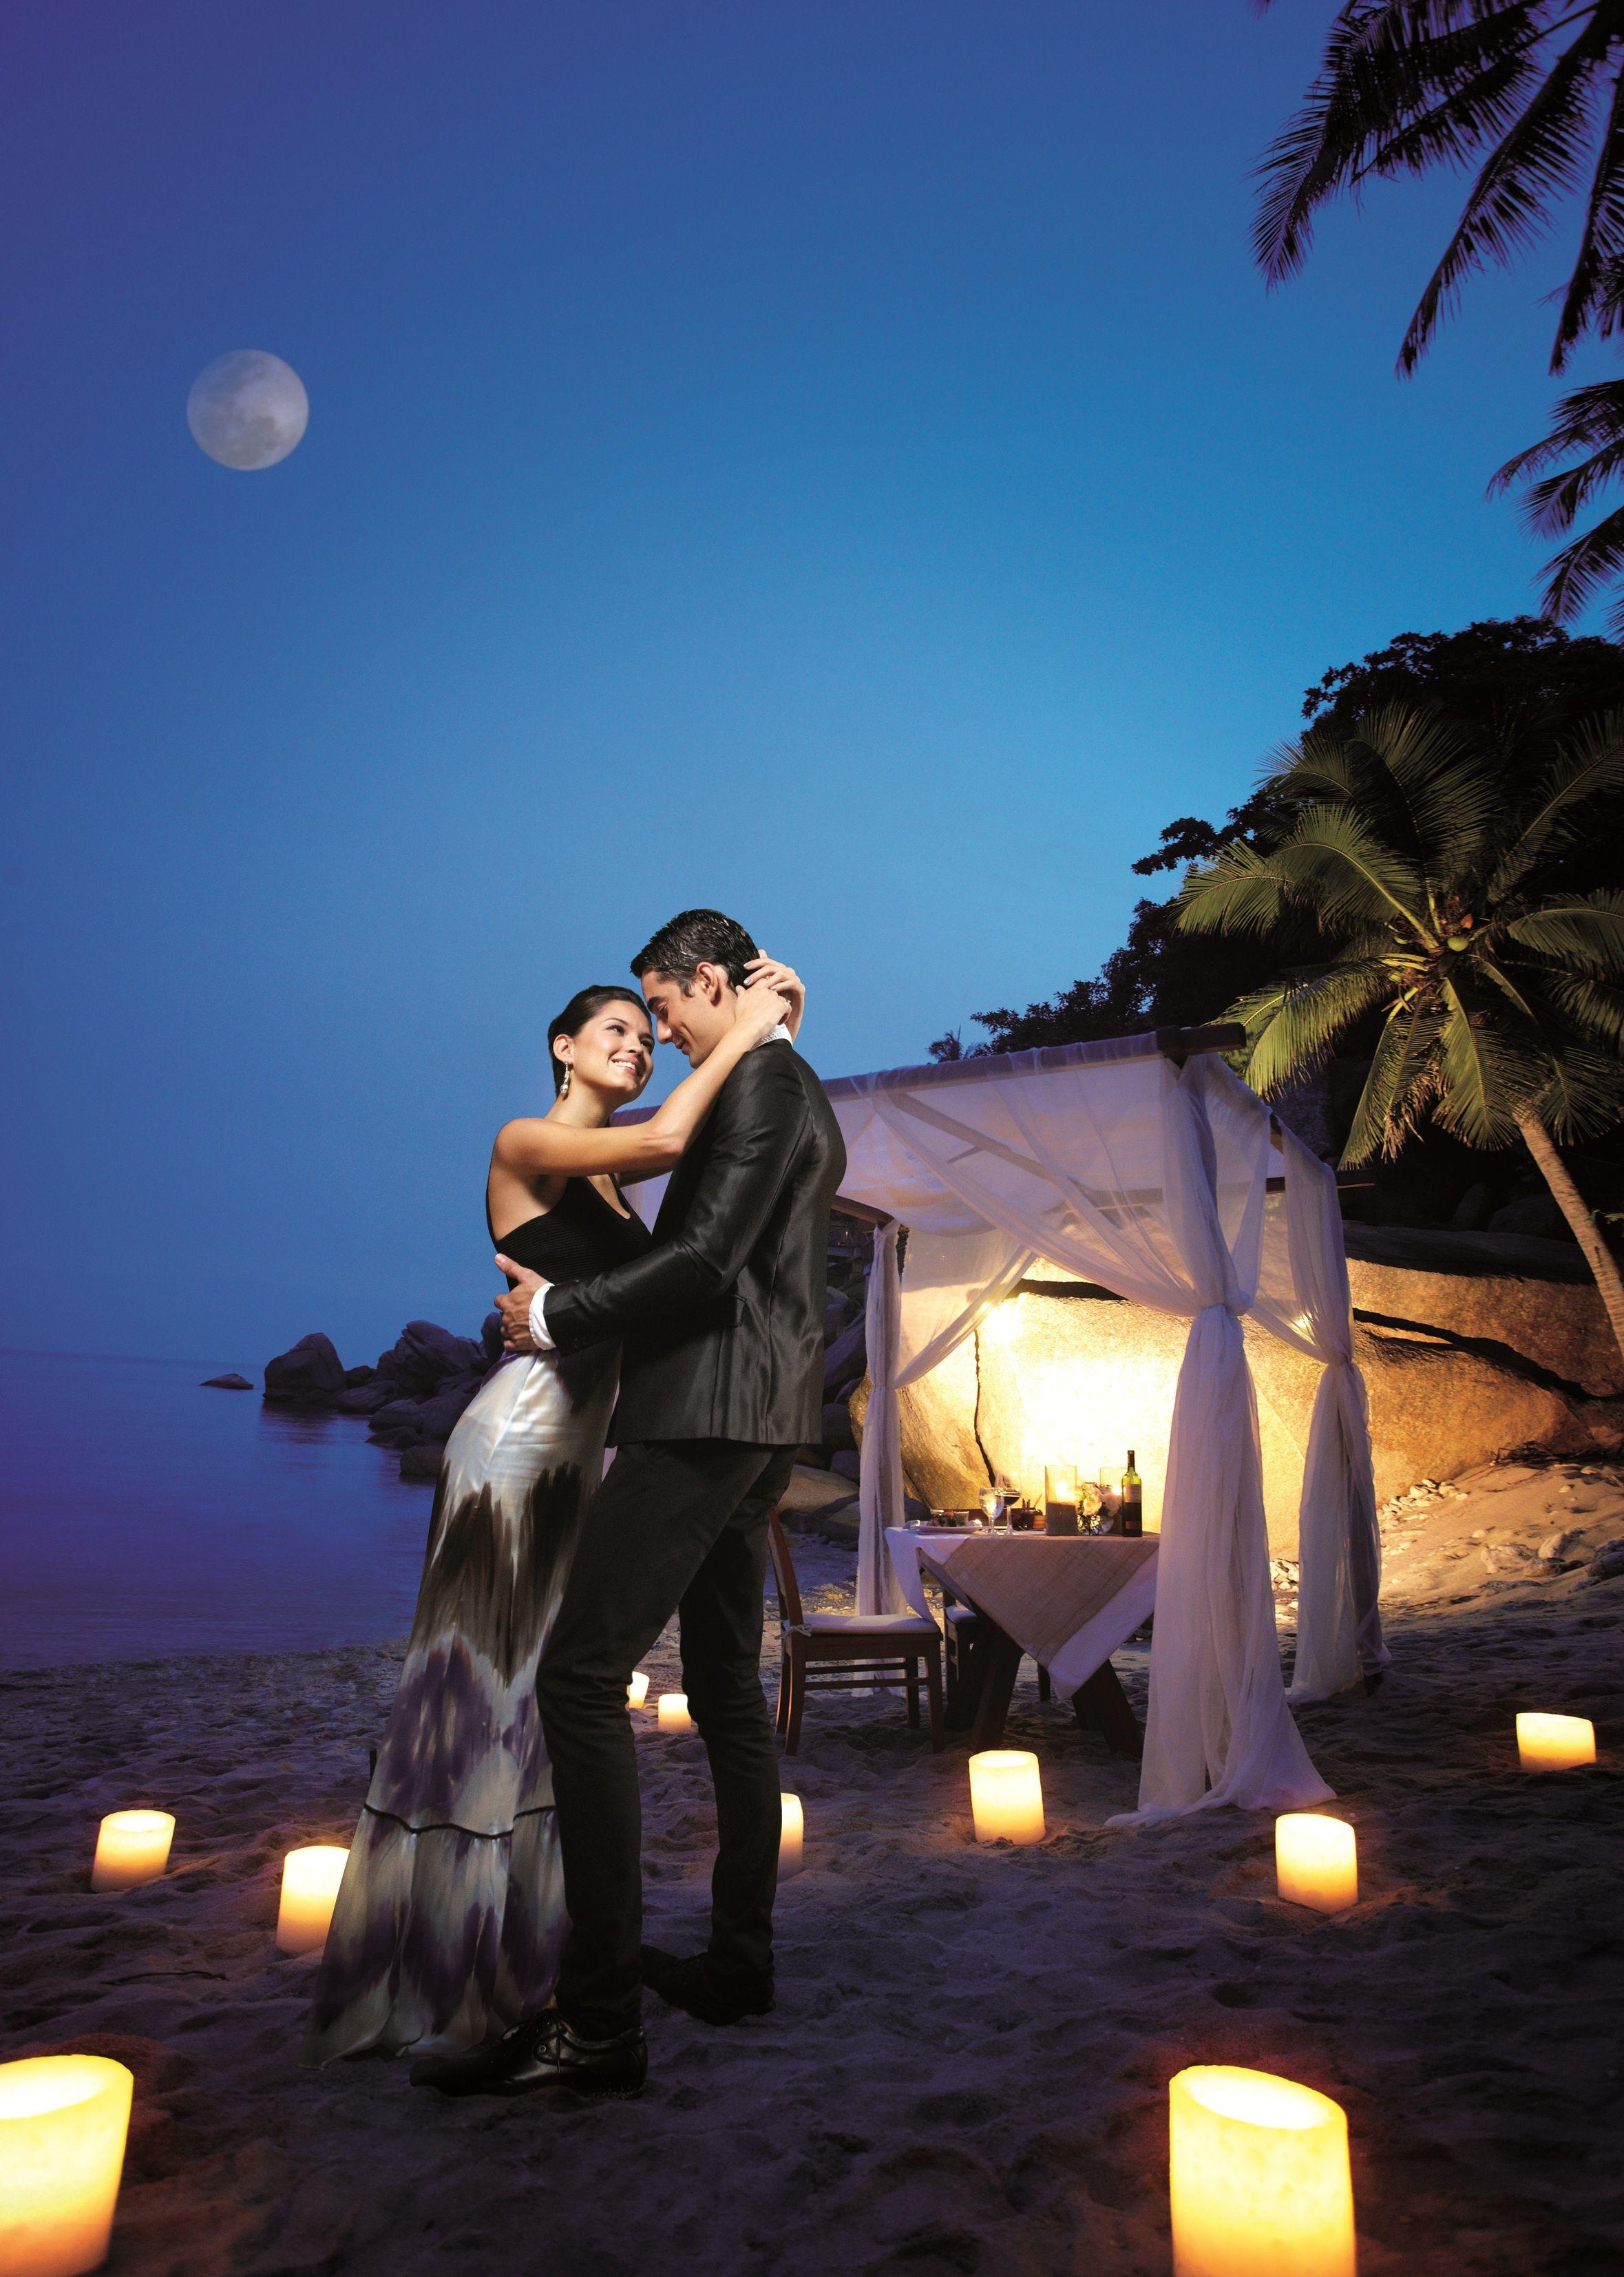 candle-light-dinner-private-beach2.jpg (2359×3307) | Romantic ...